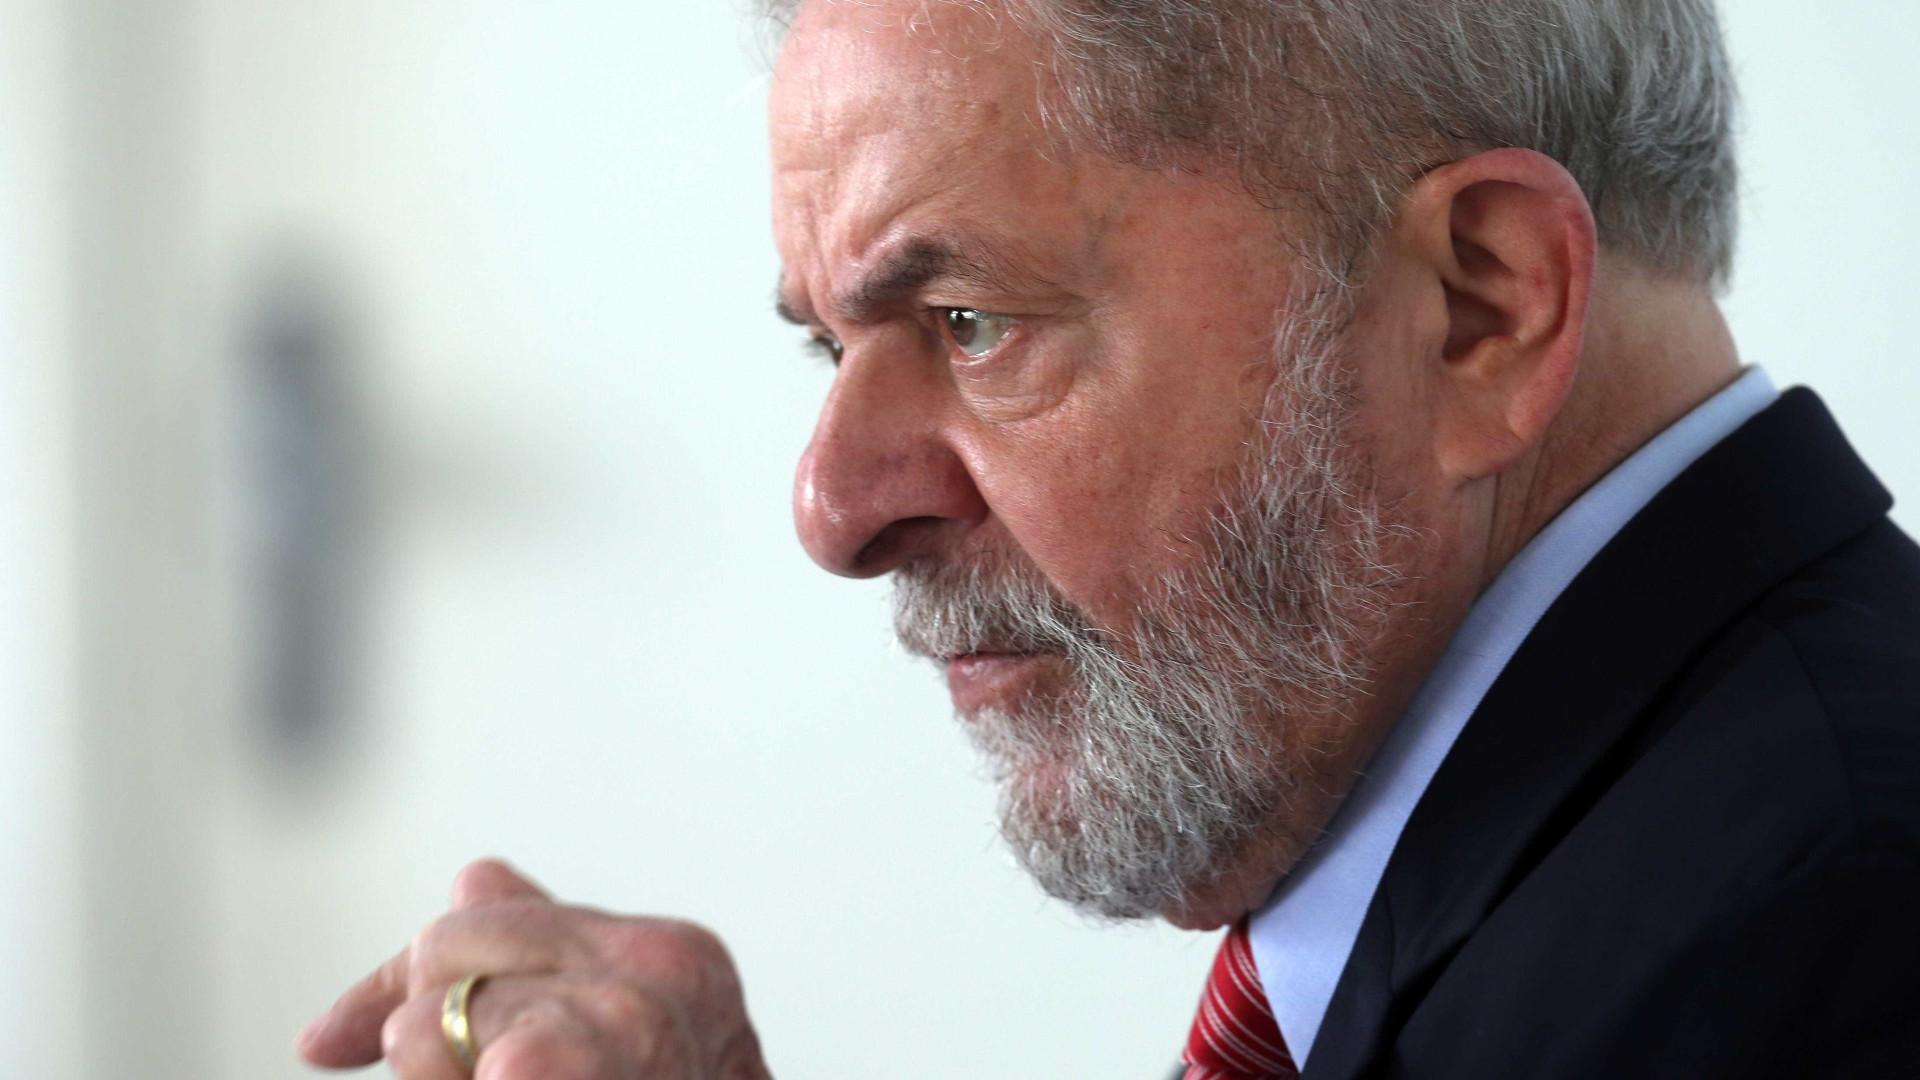 Ala quer PT fora da corrida presidencial caso Lula seja condenado